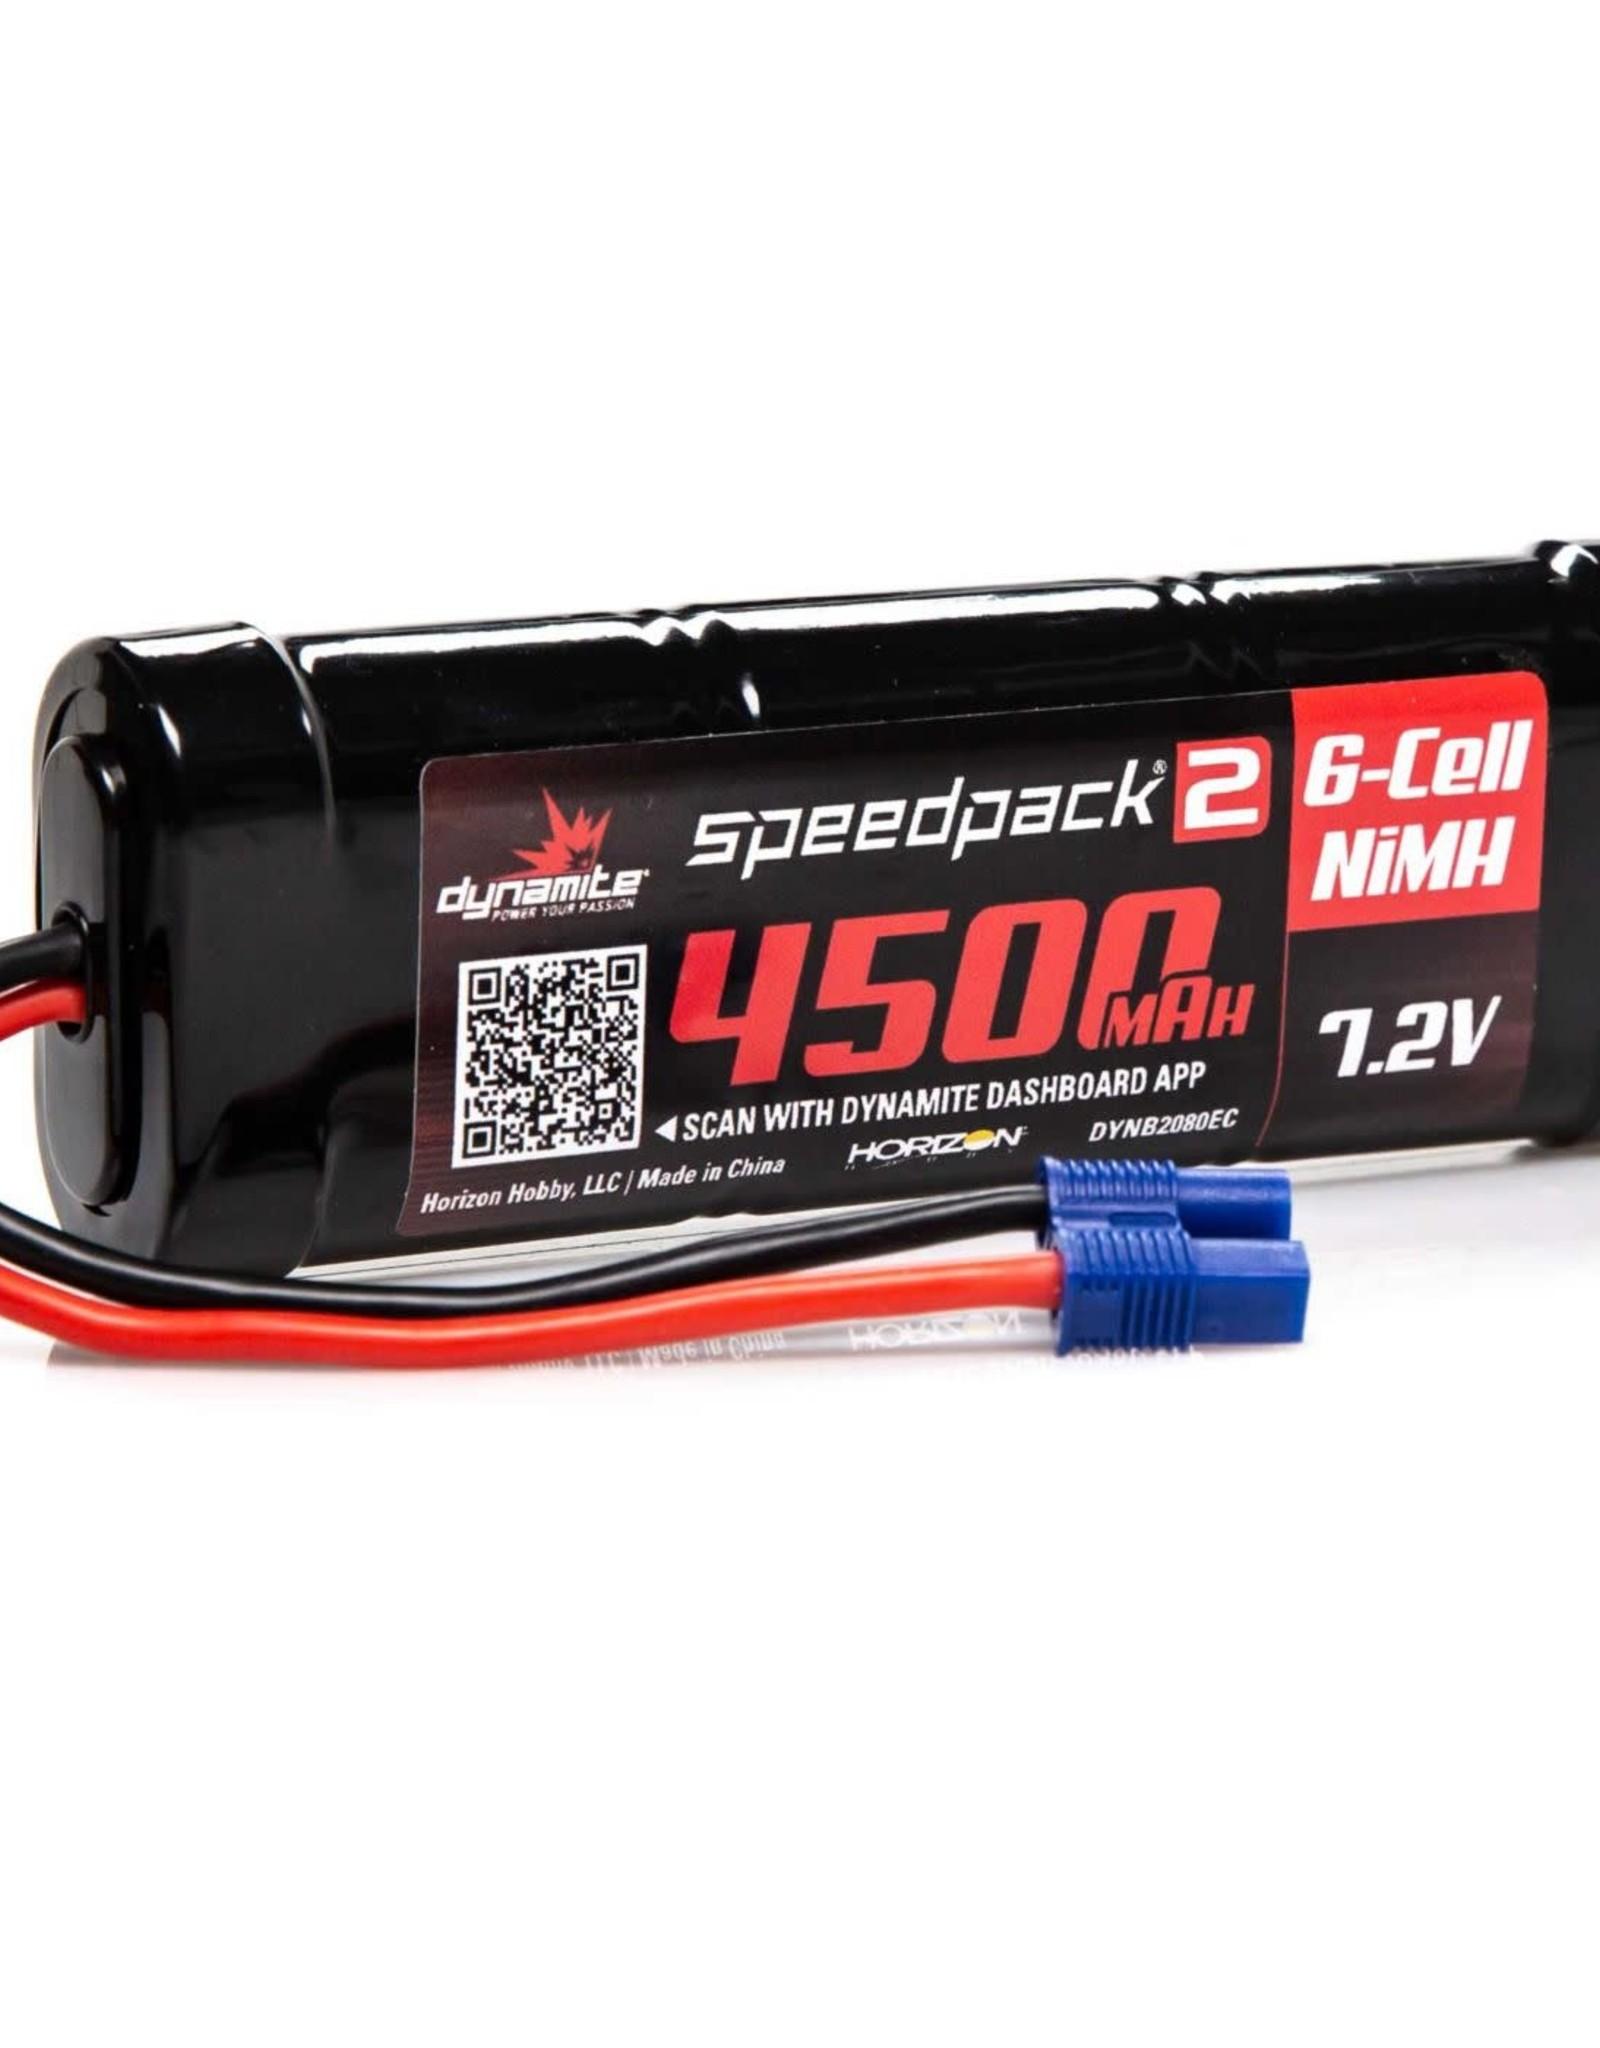 7.2V 4500mAh 6-Cell Speedpack2 Flat NiMH Battery: EC3